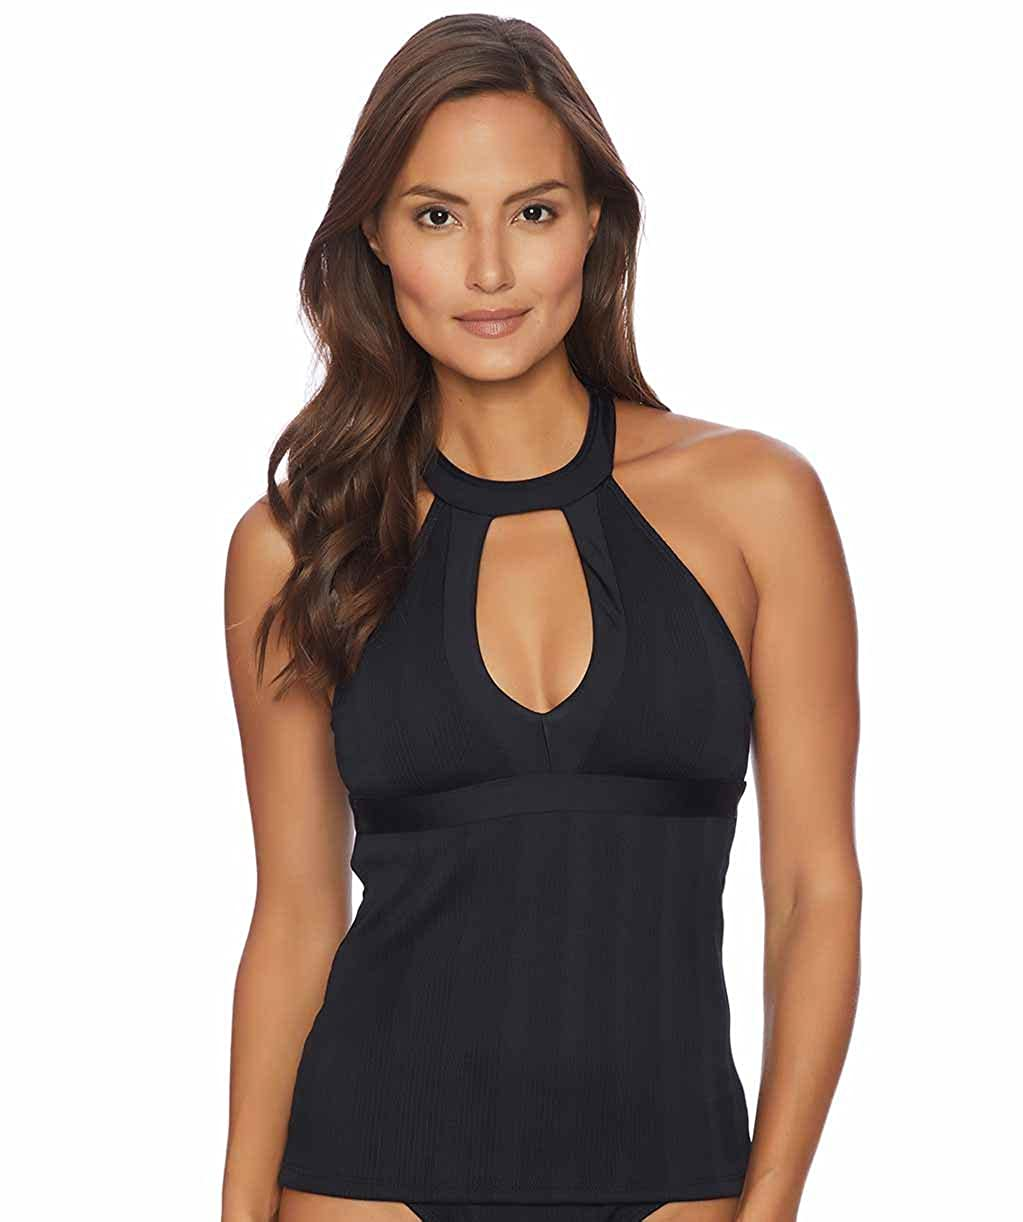 e50eca95a93d2 Athena Womens Standard Fine Line Halter Swimsuit Tankini Top Athena Women's  Swimwear AT16298